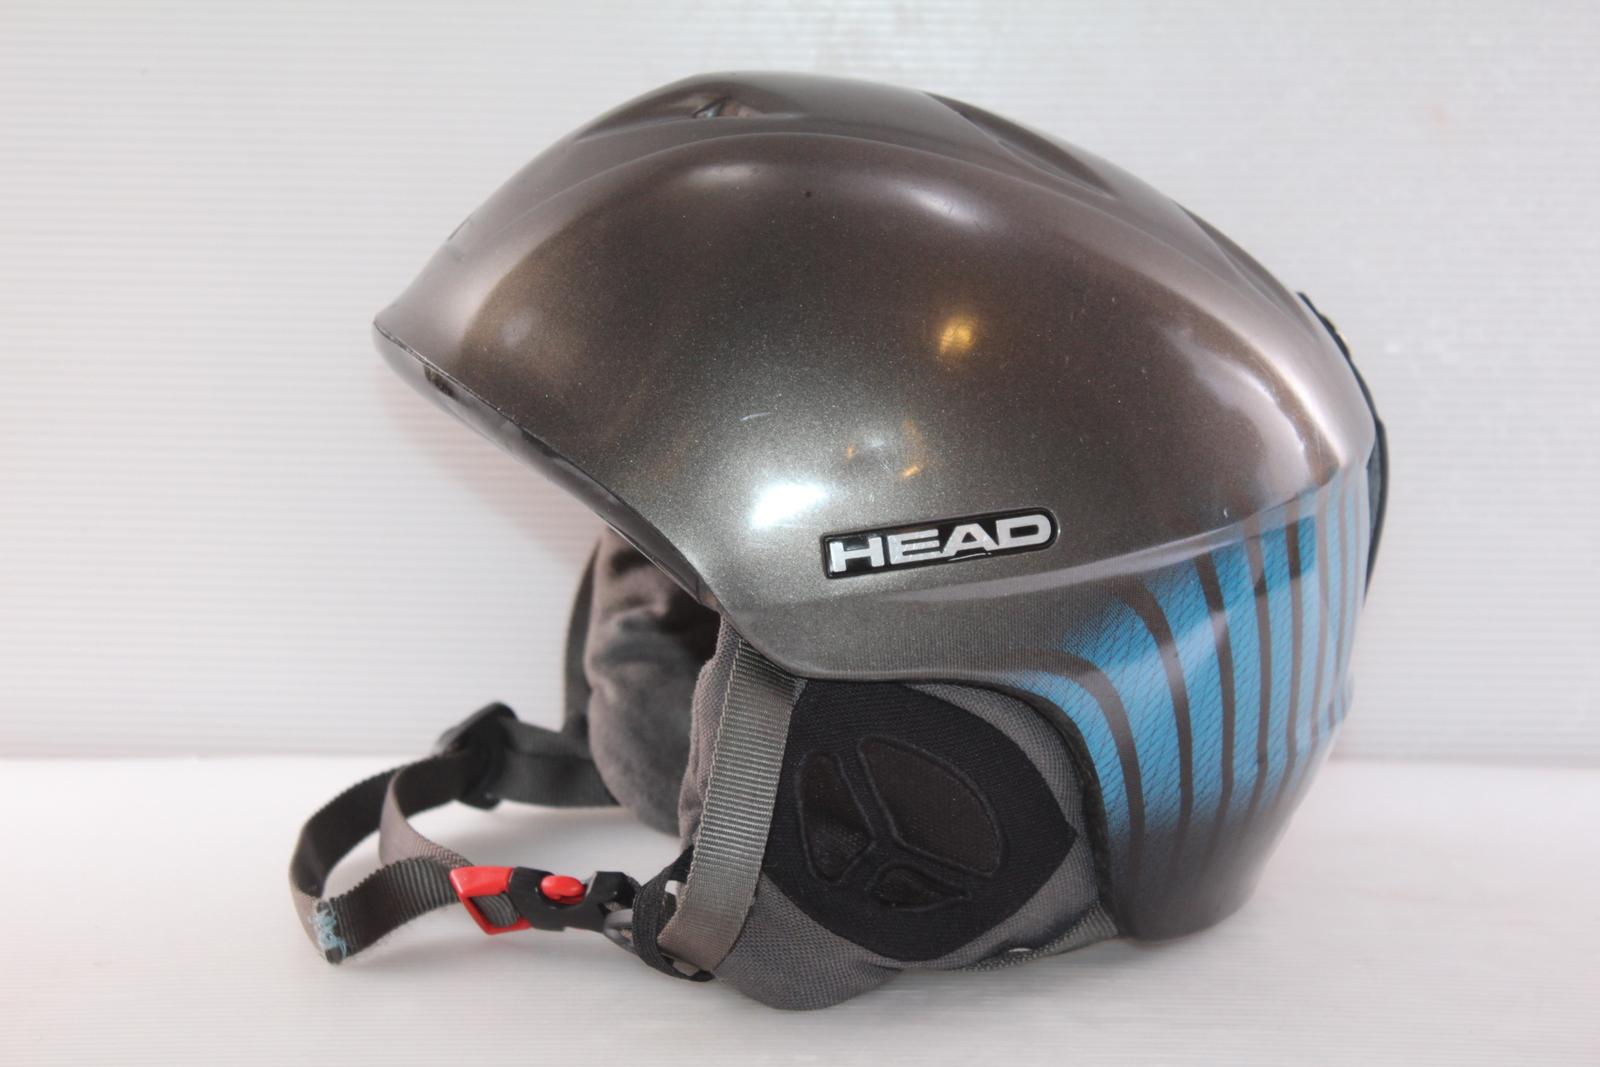 Lyžařská helma Head Head vel. 56